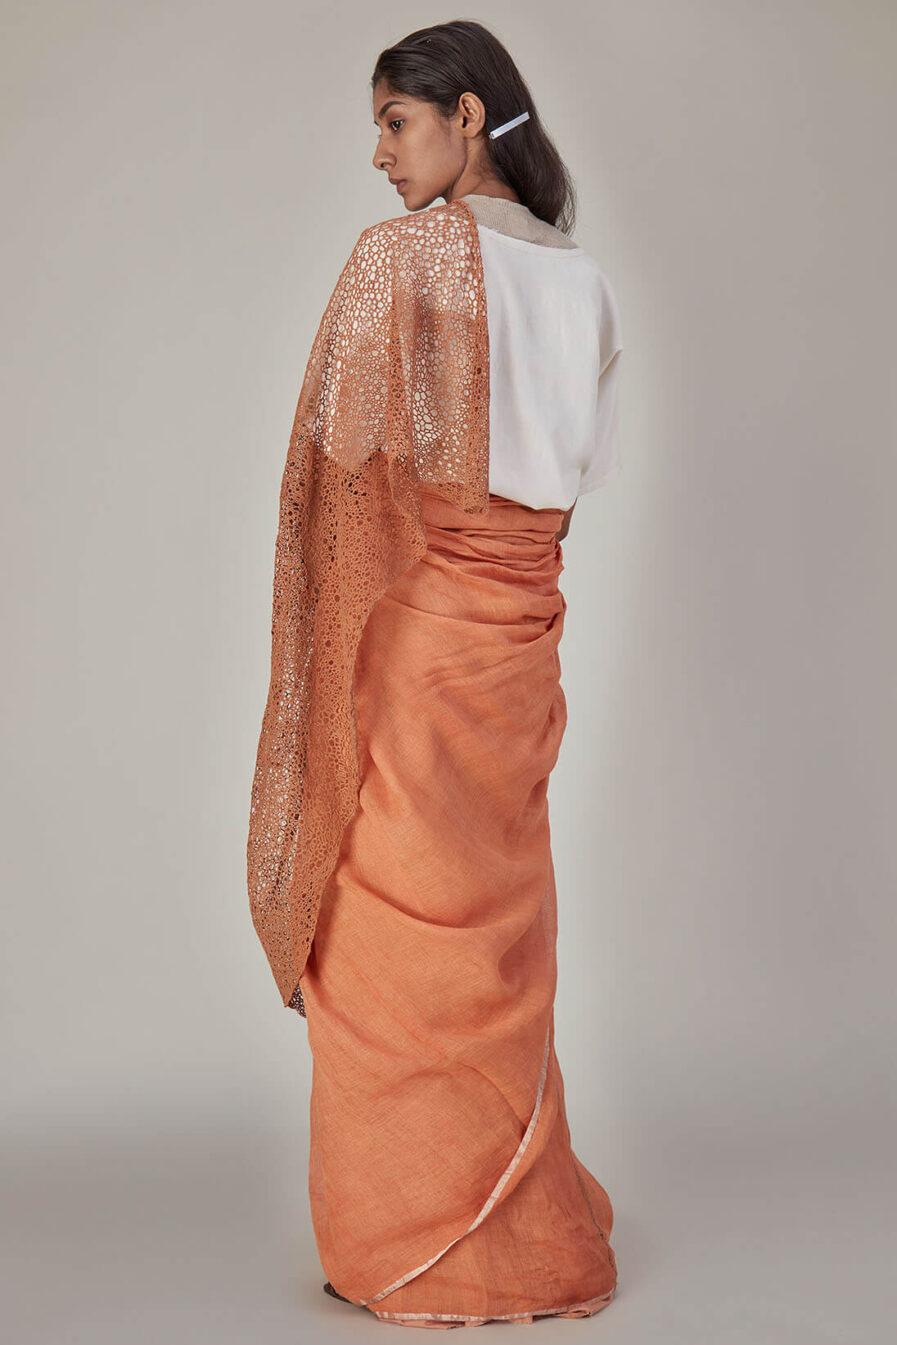 Anavila Peach Basket Weave Pallu Sari